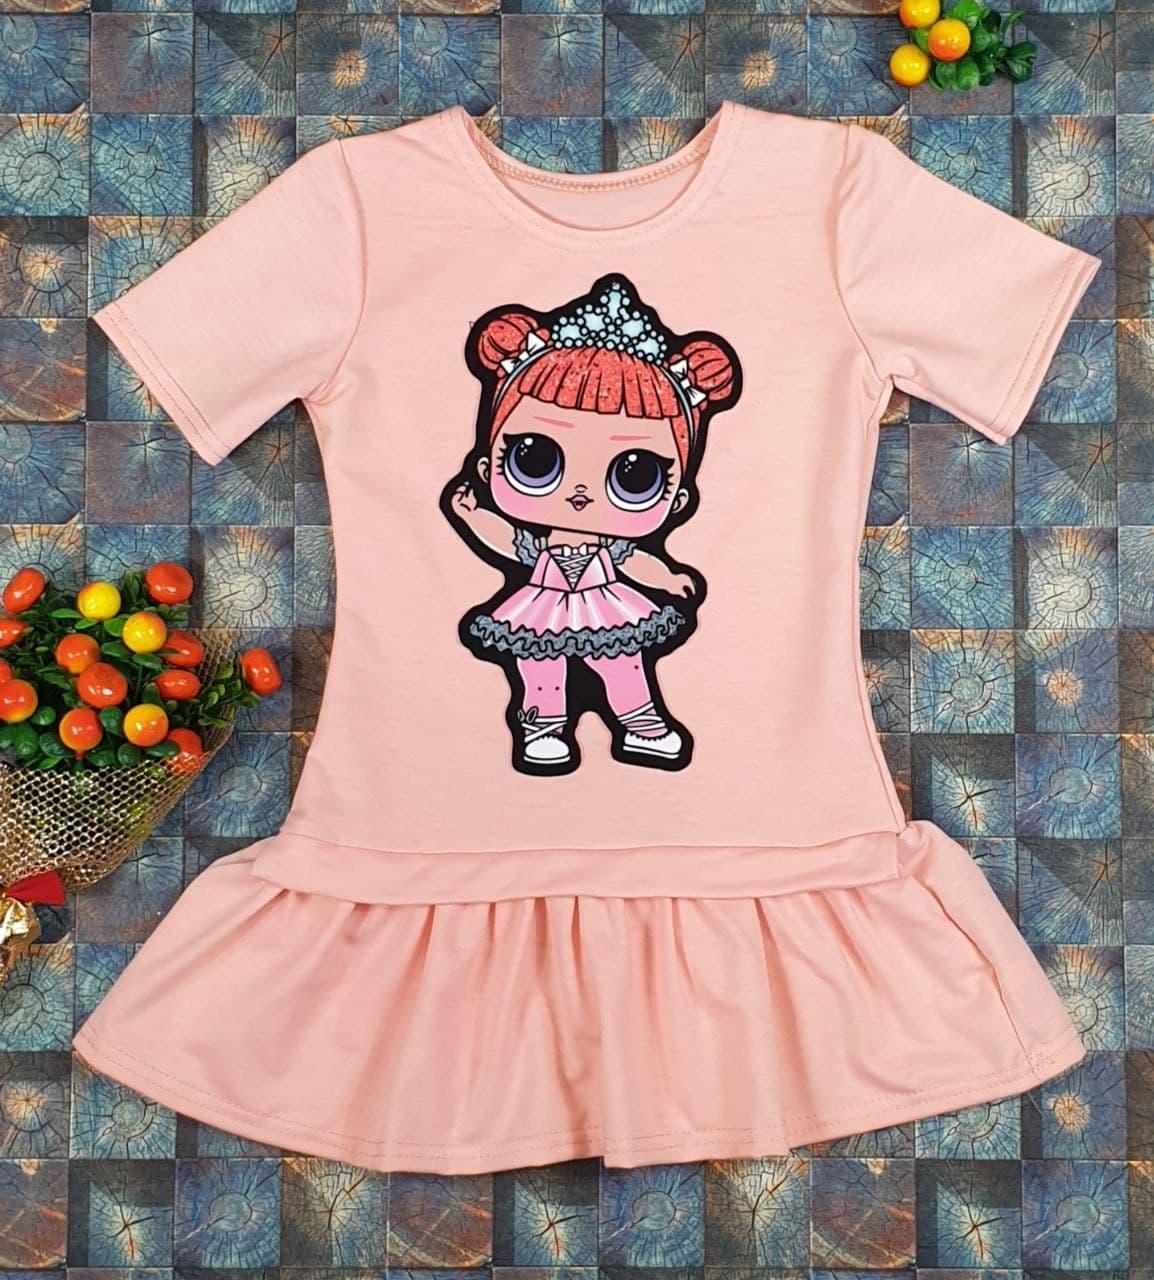 Платье Лола с коротким рукавом  на девочку 104, 110, 116, 122 см,  персик